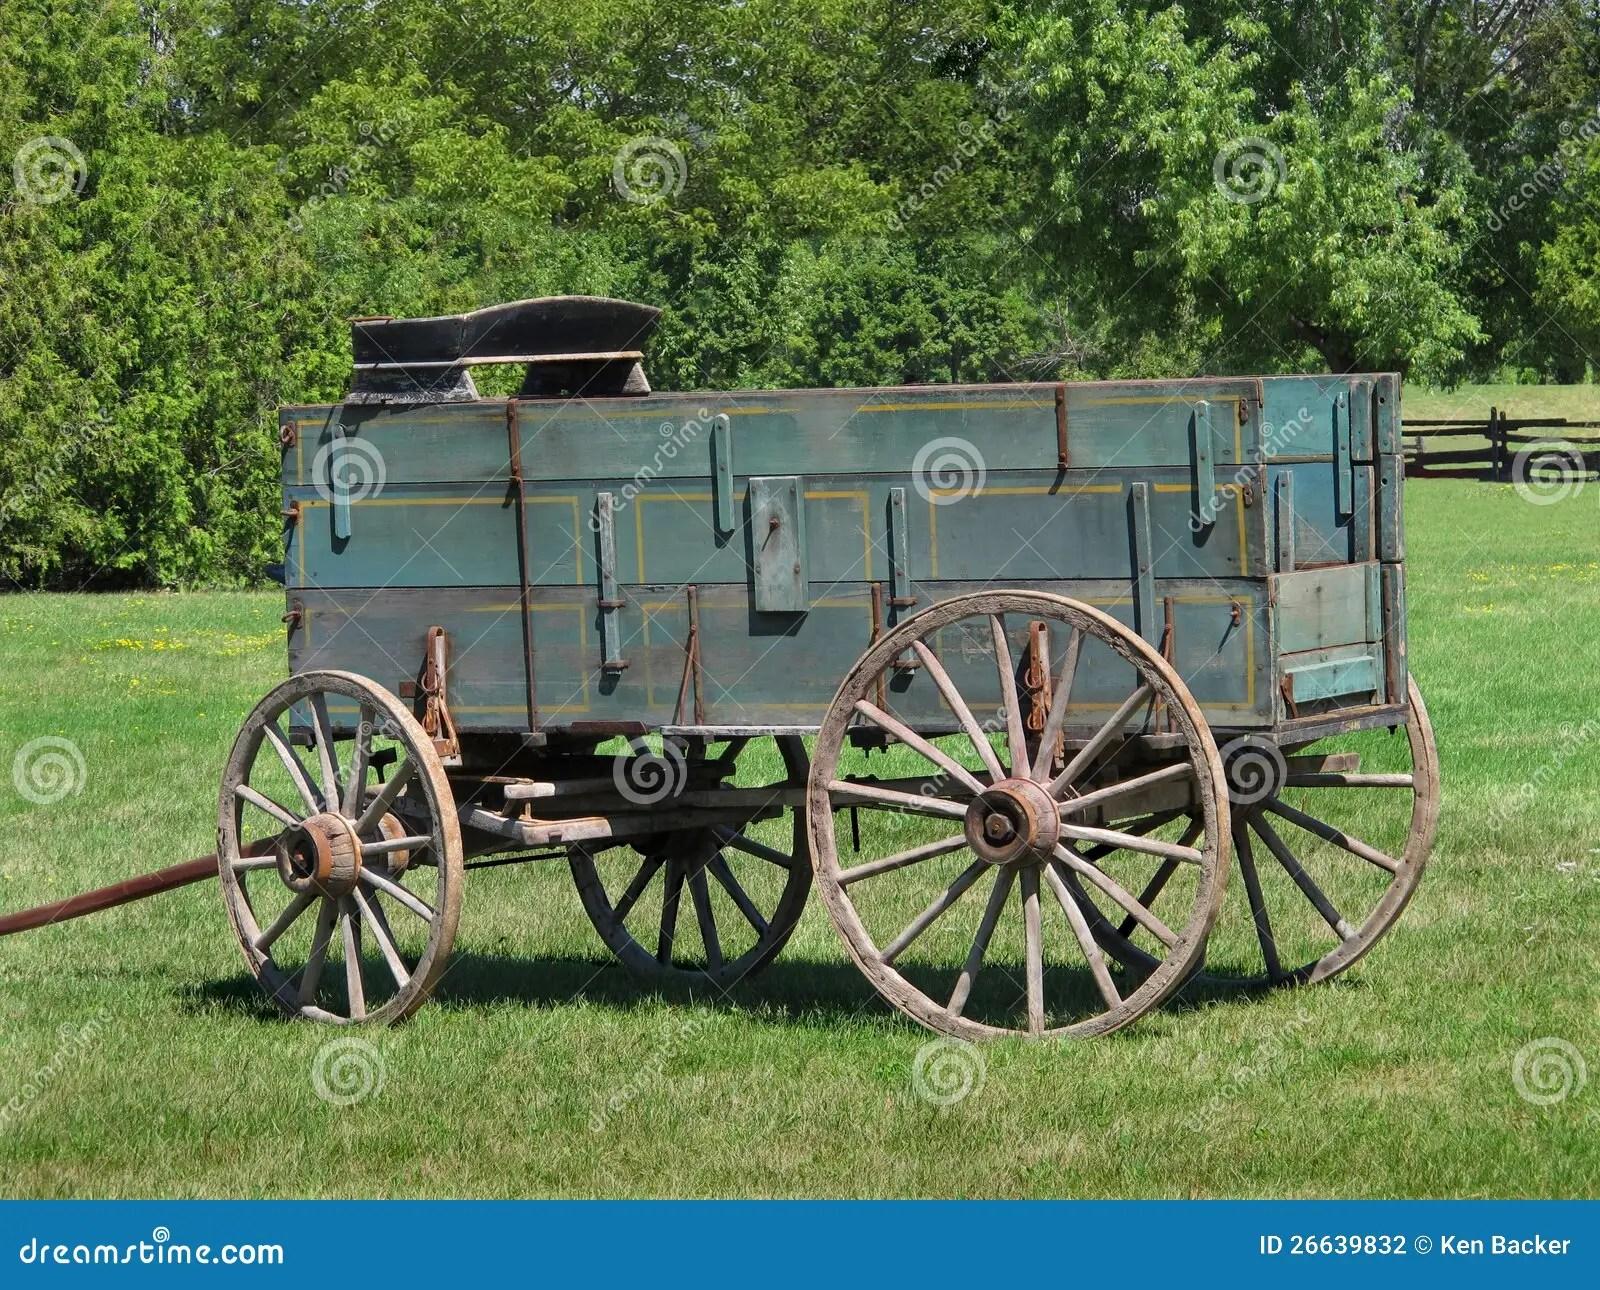 Old Wooden Buckboard Farm Wagon Stock Photography